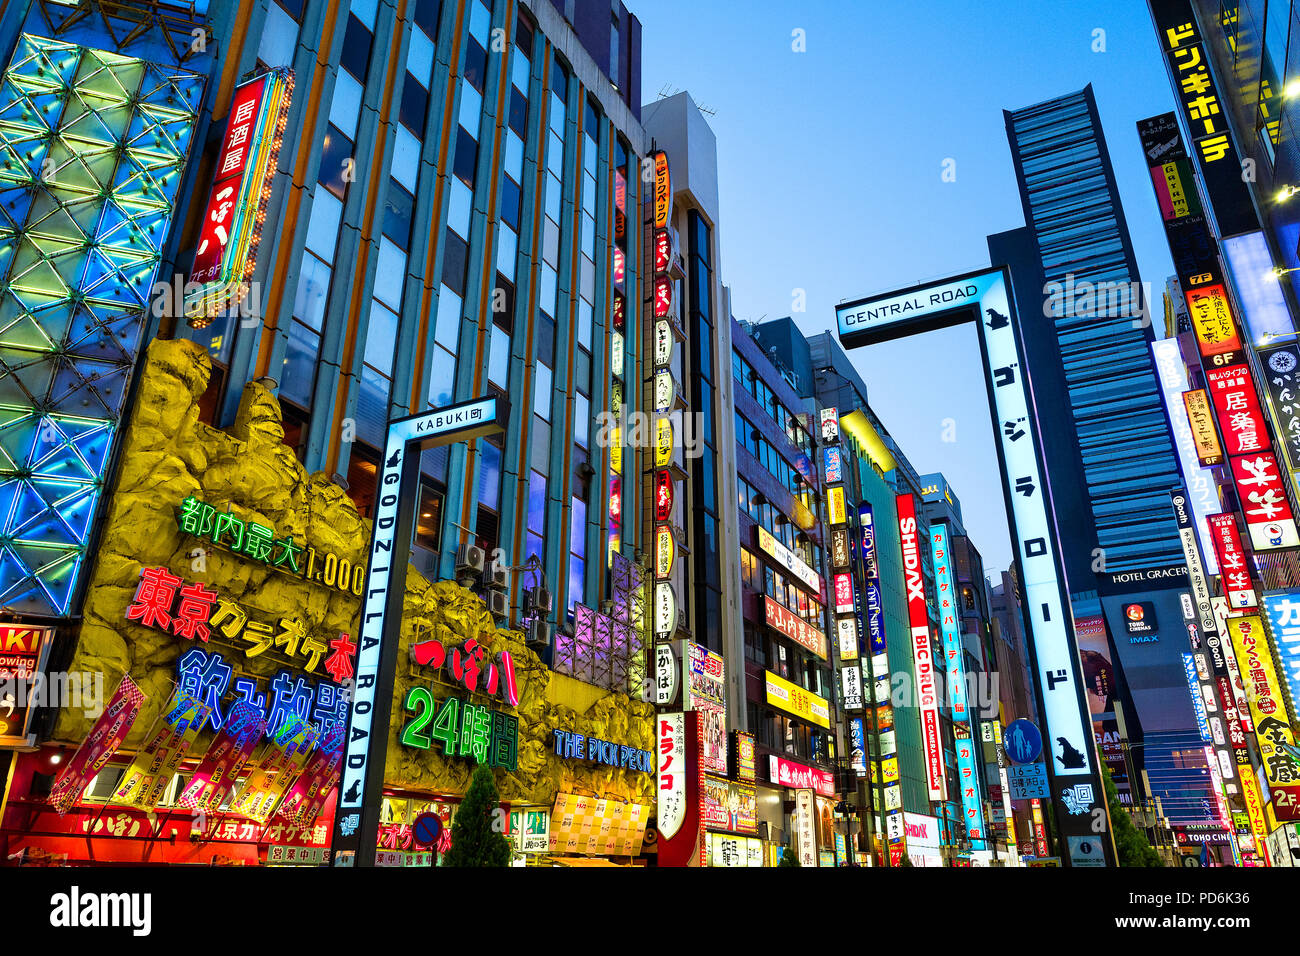 Japan, Honshu island, Kanto, Tokyo, by the streets at night in the Kabuki-cho. - Stock Image